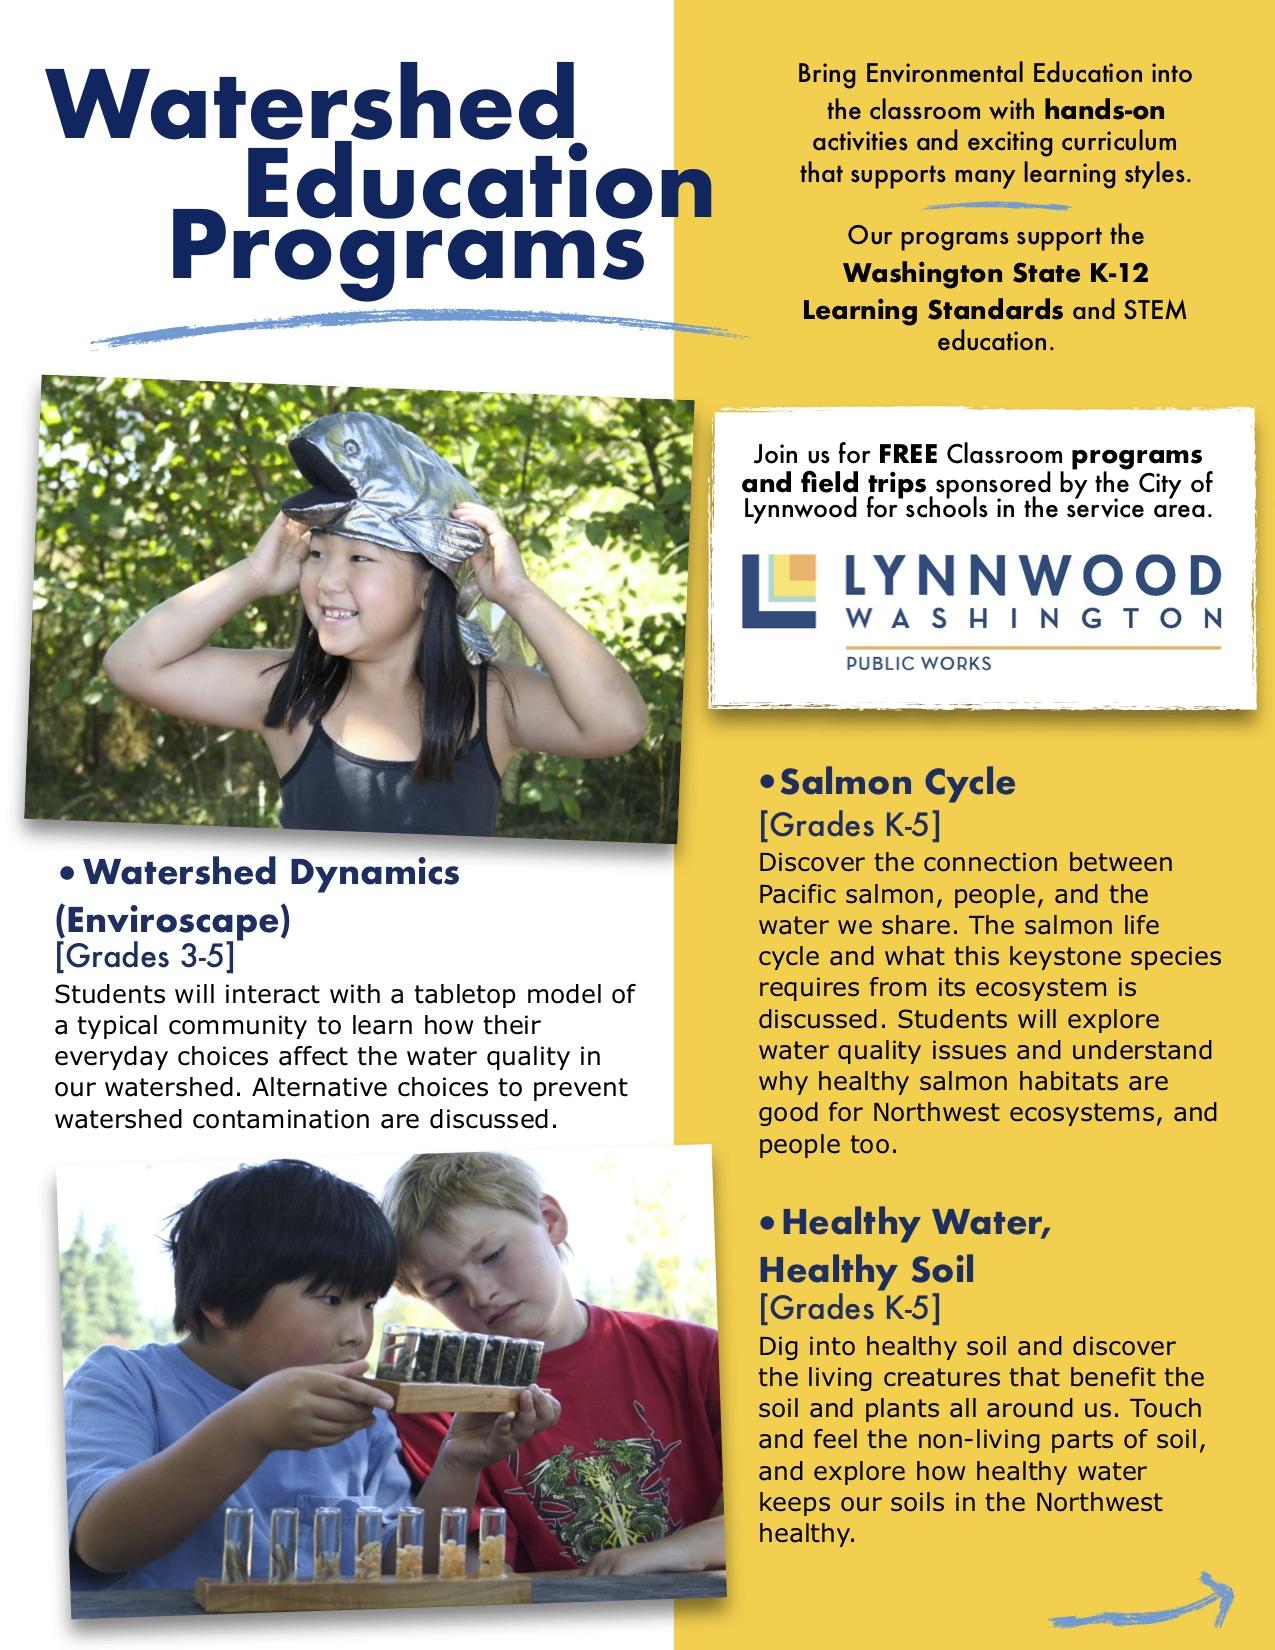 City of Lynnwood - Elementary